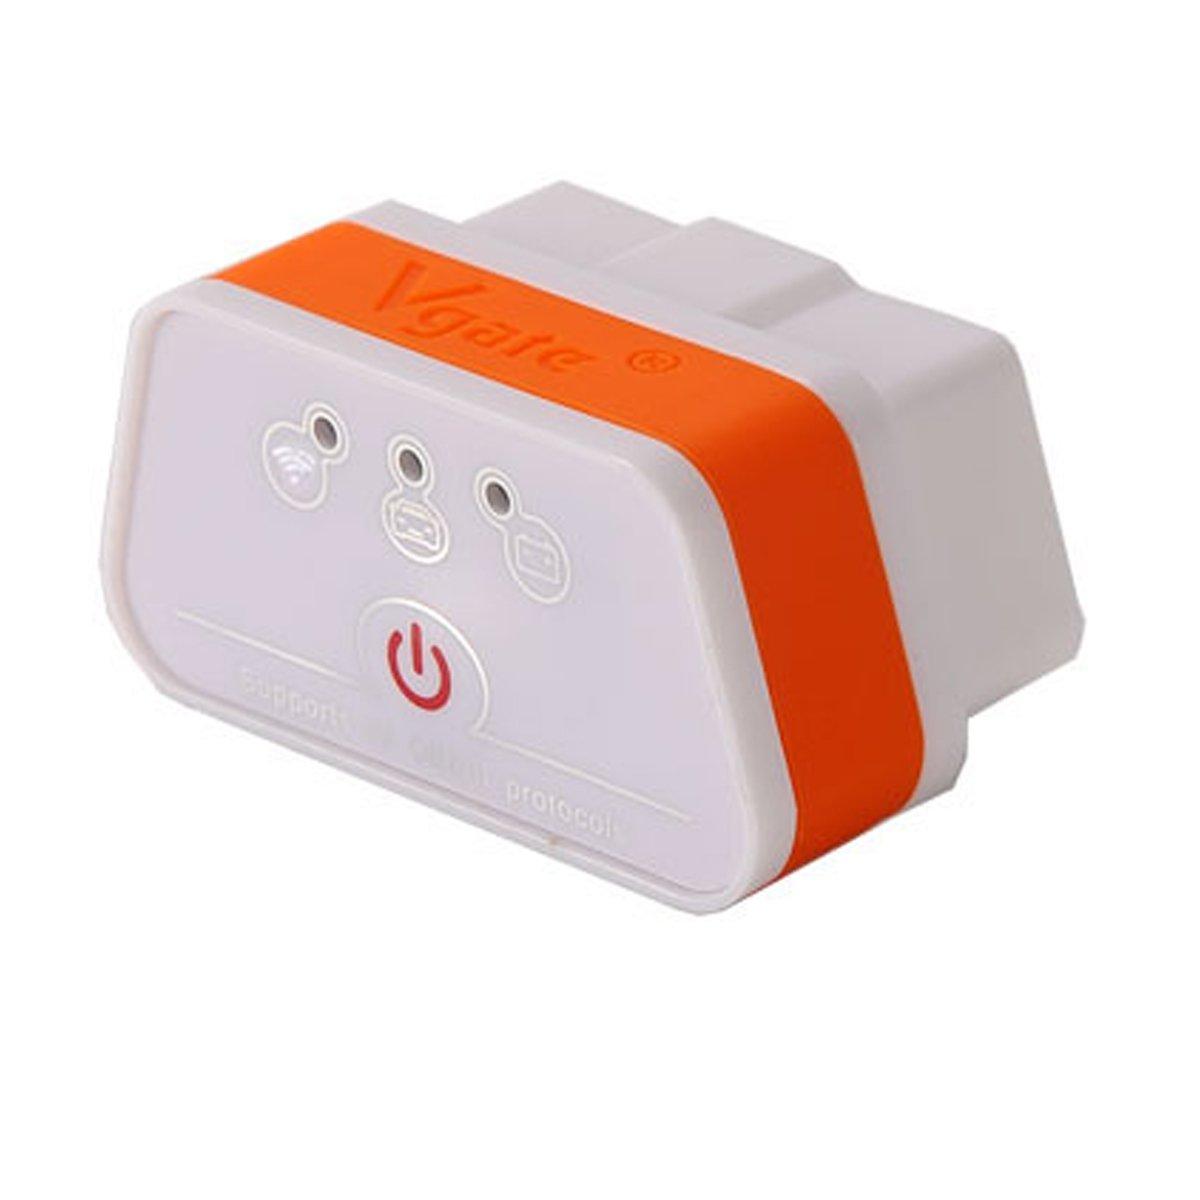 IDS Home ELM327 Wi-Fi OBD2 Car Diagnostic Tool Plastic - Orange + White